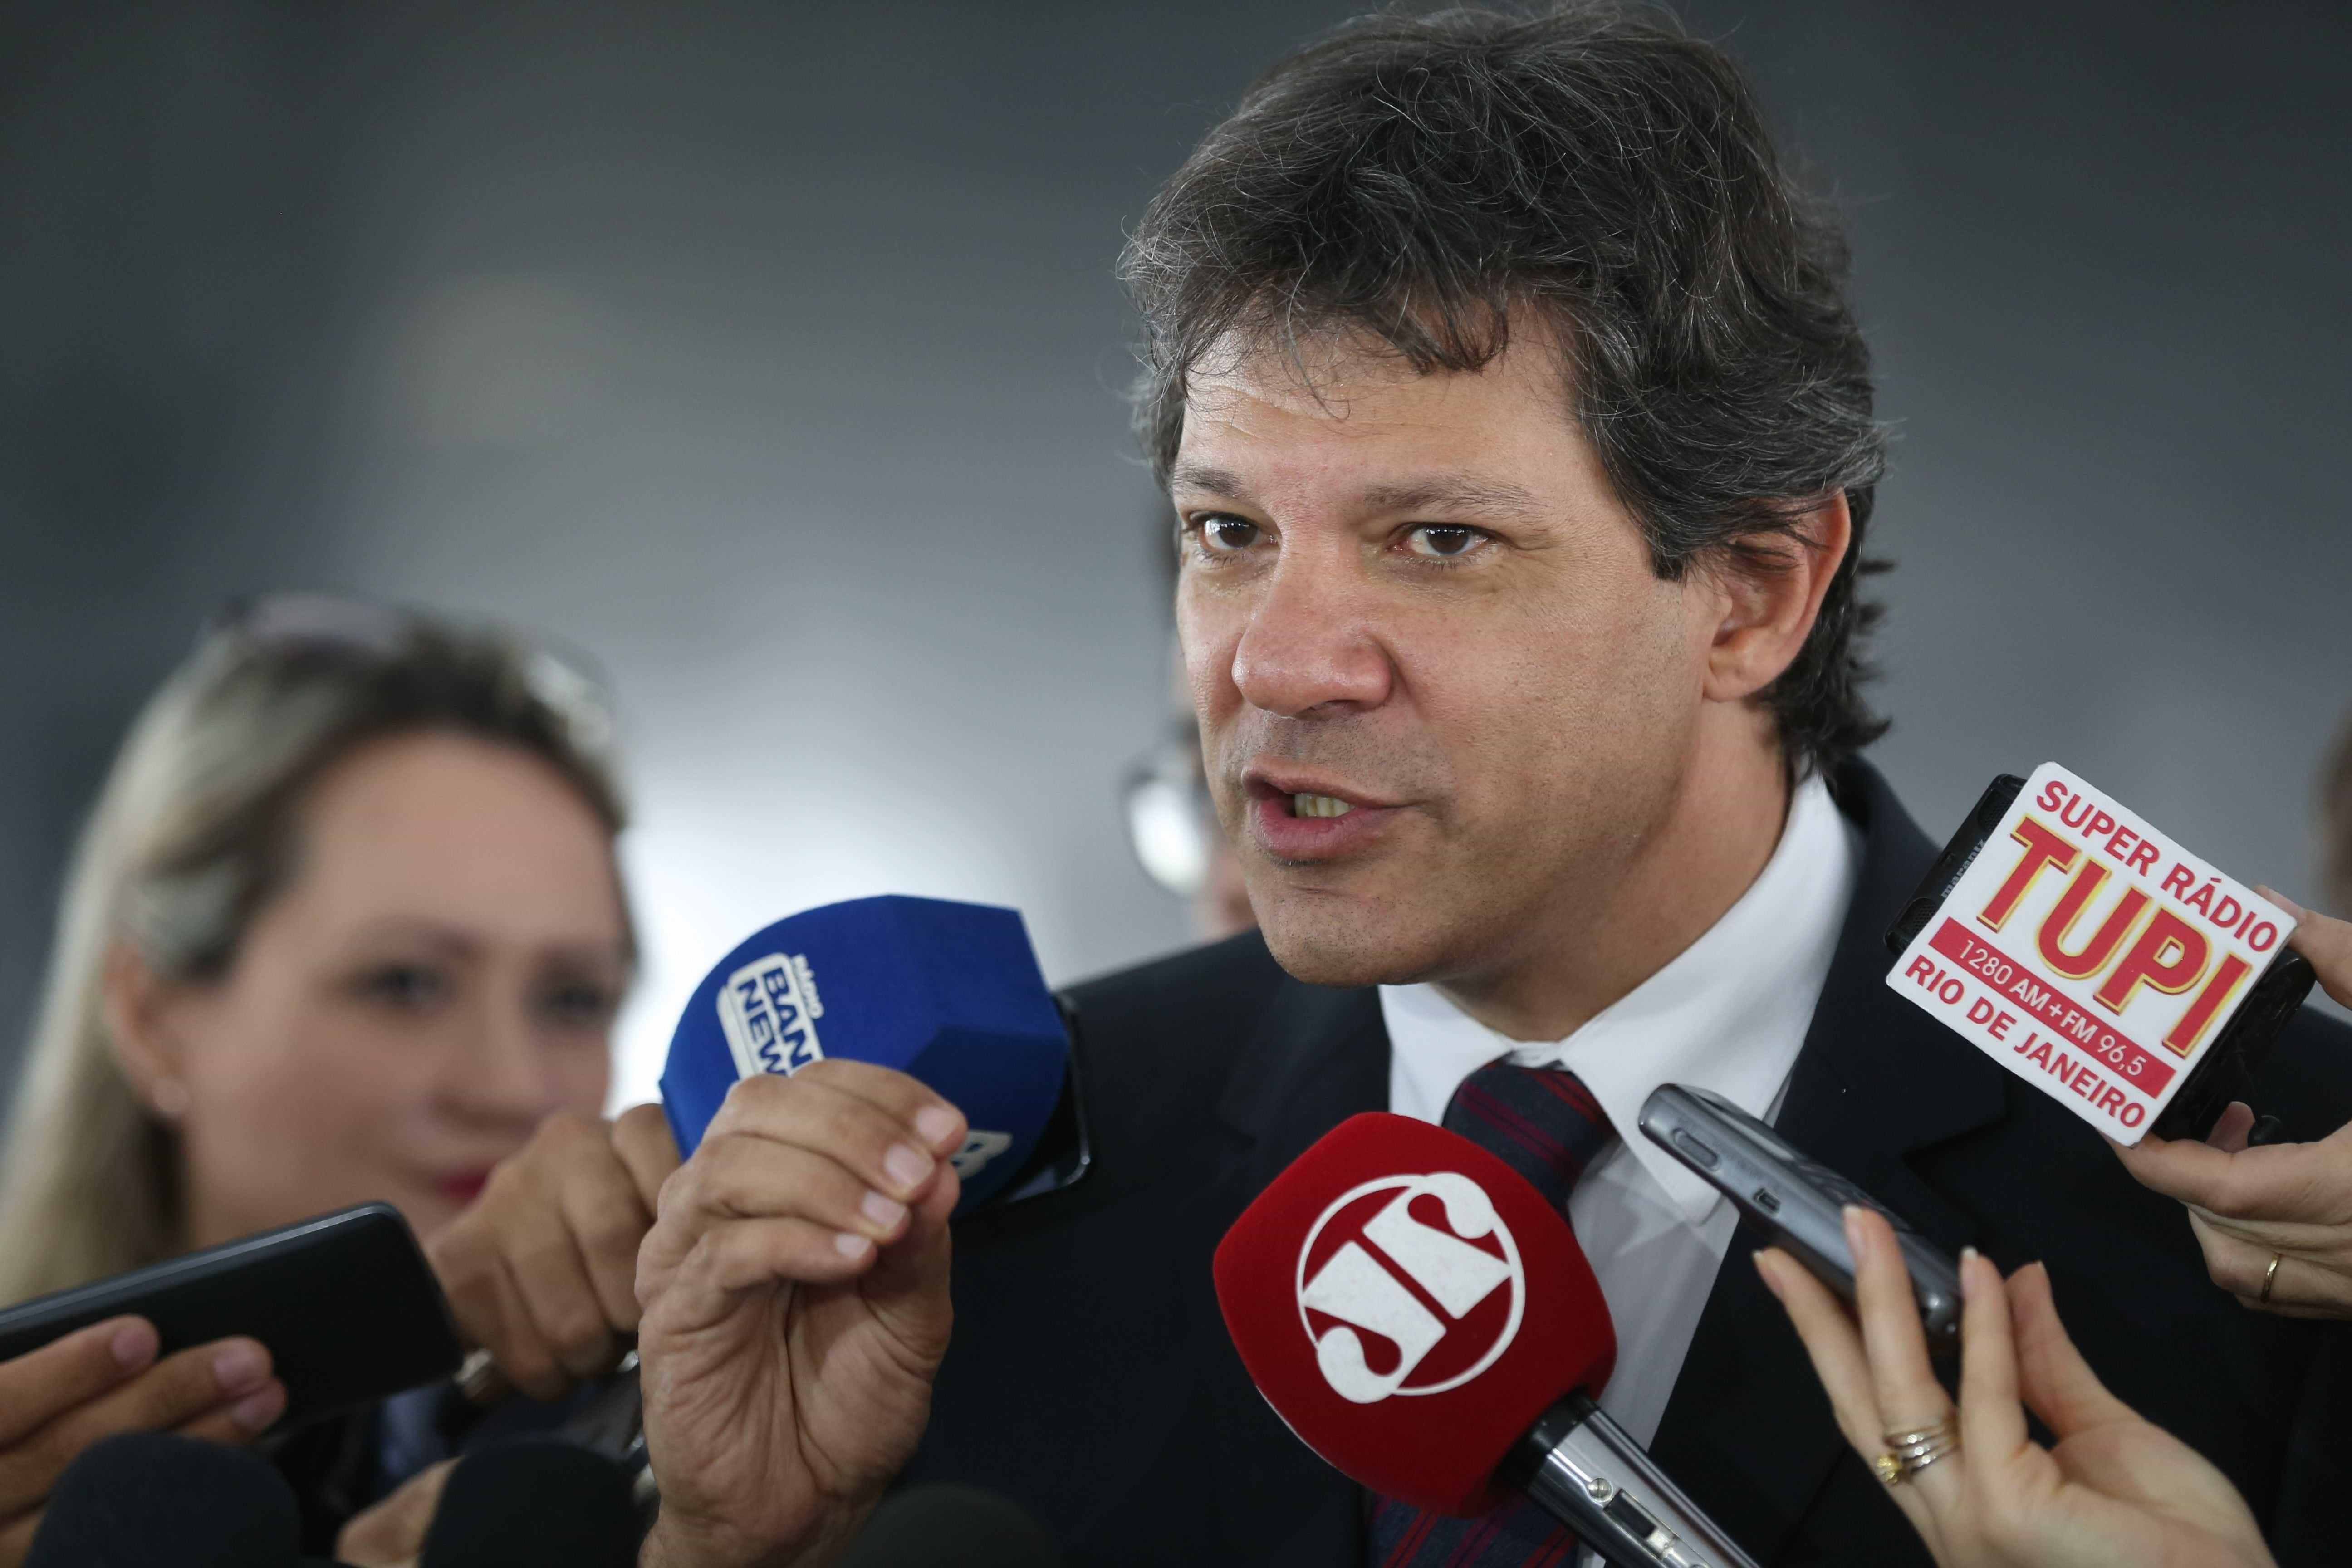 Haddad questiona patrimônio imobiliário de R$15 mi da família Bolsonaro